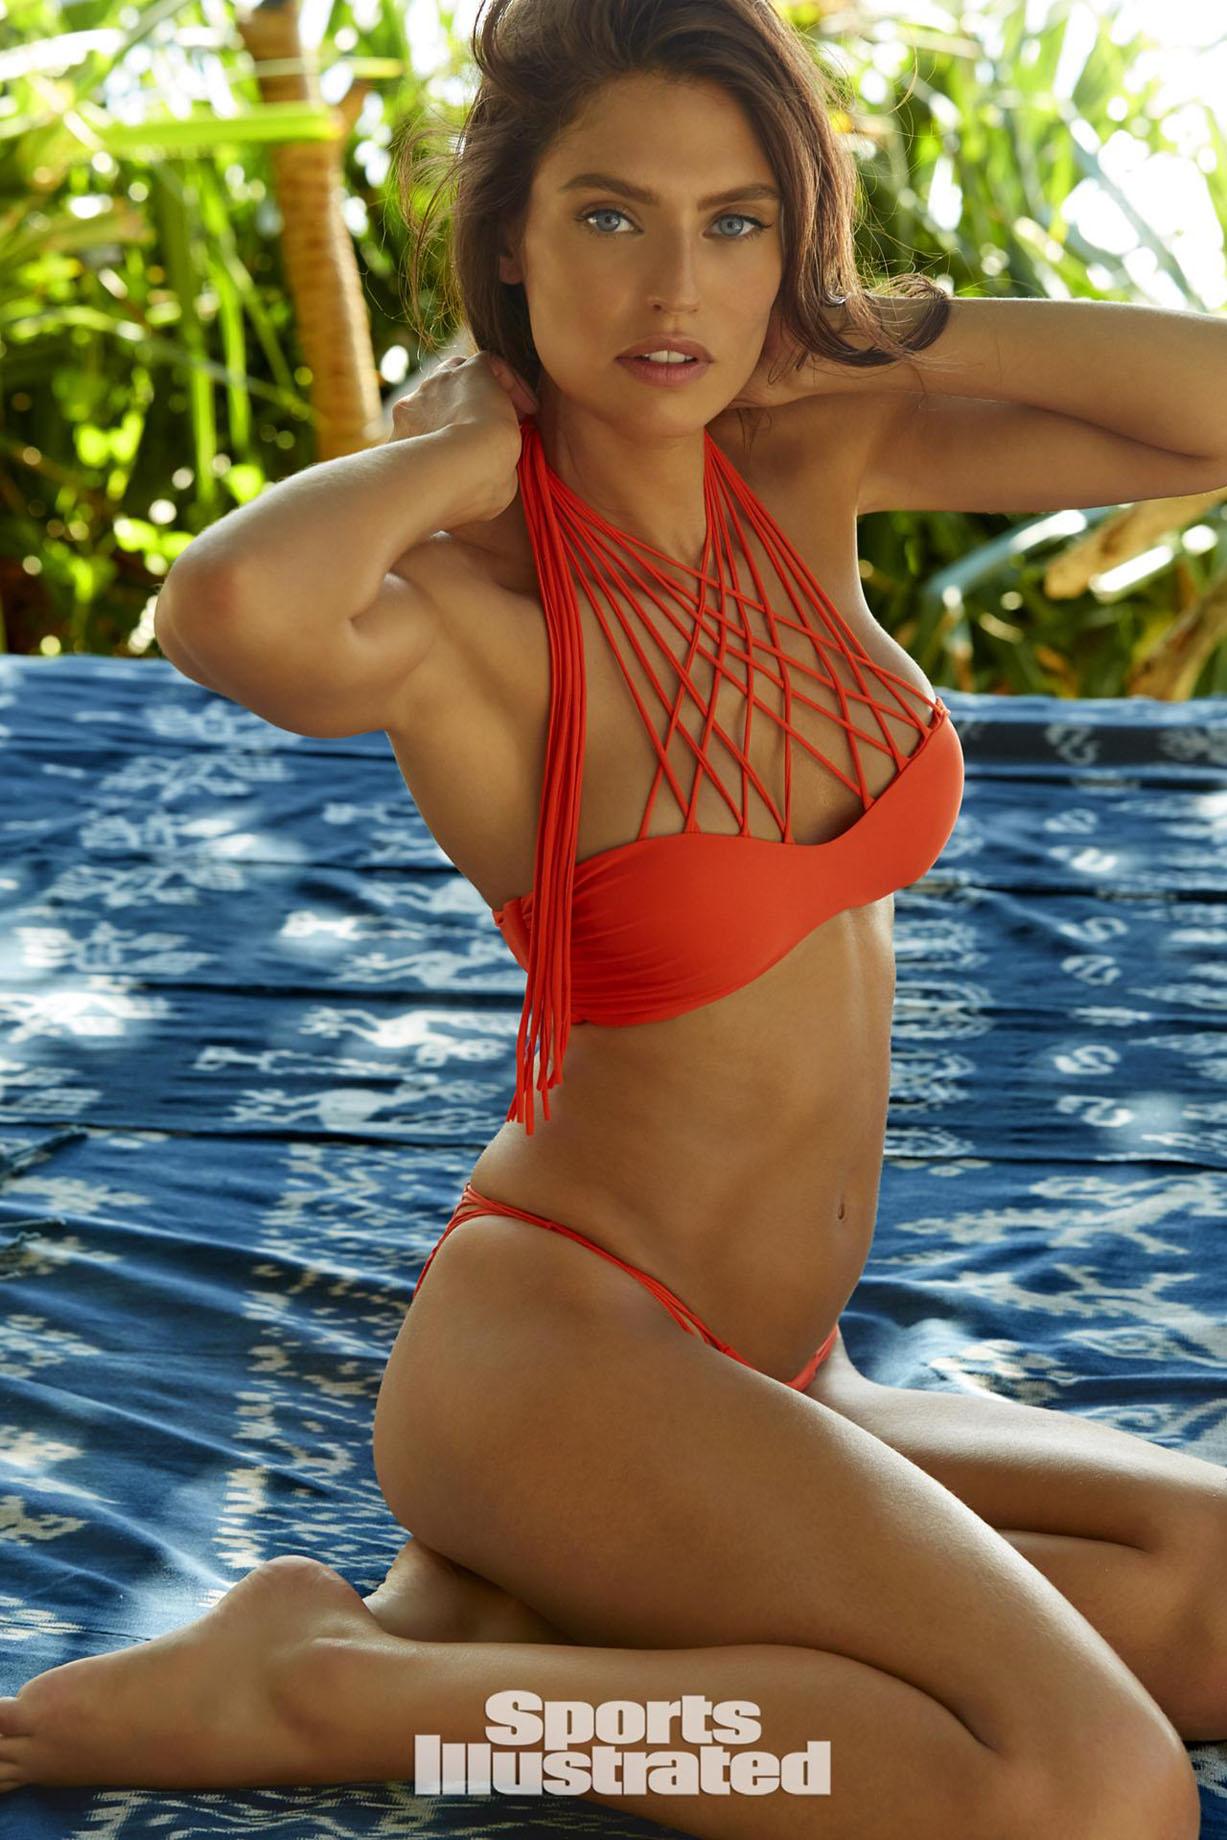 Bianca Balti / Бьянка Бэлти в купальниках из новой коллекции Sports Illustrated Swimsuit 2017 issue / in Sumba Island by James Macari